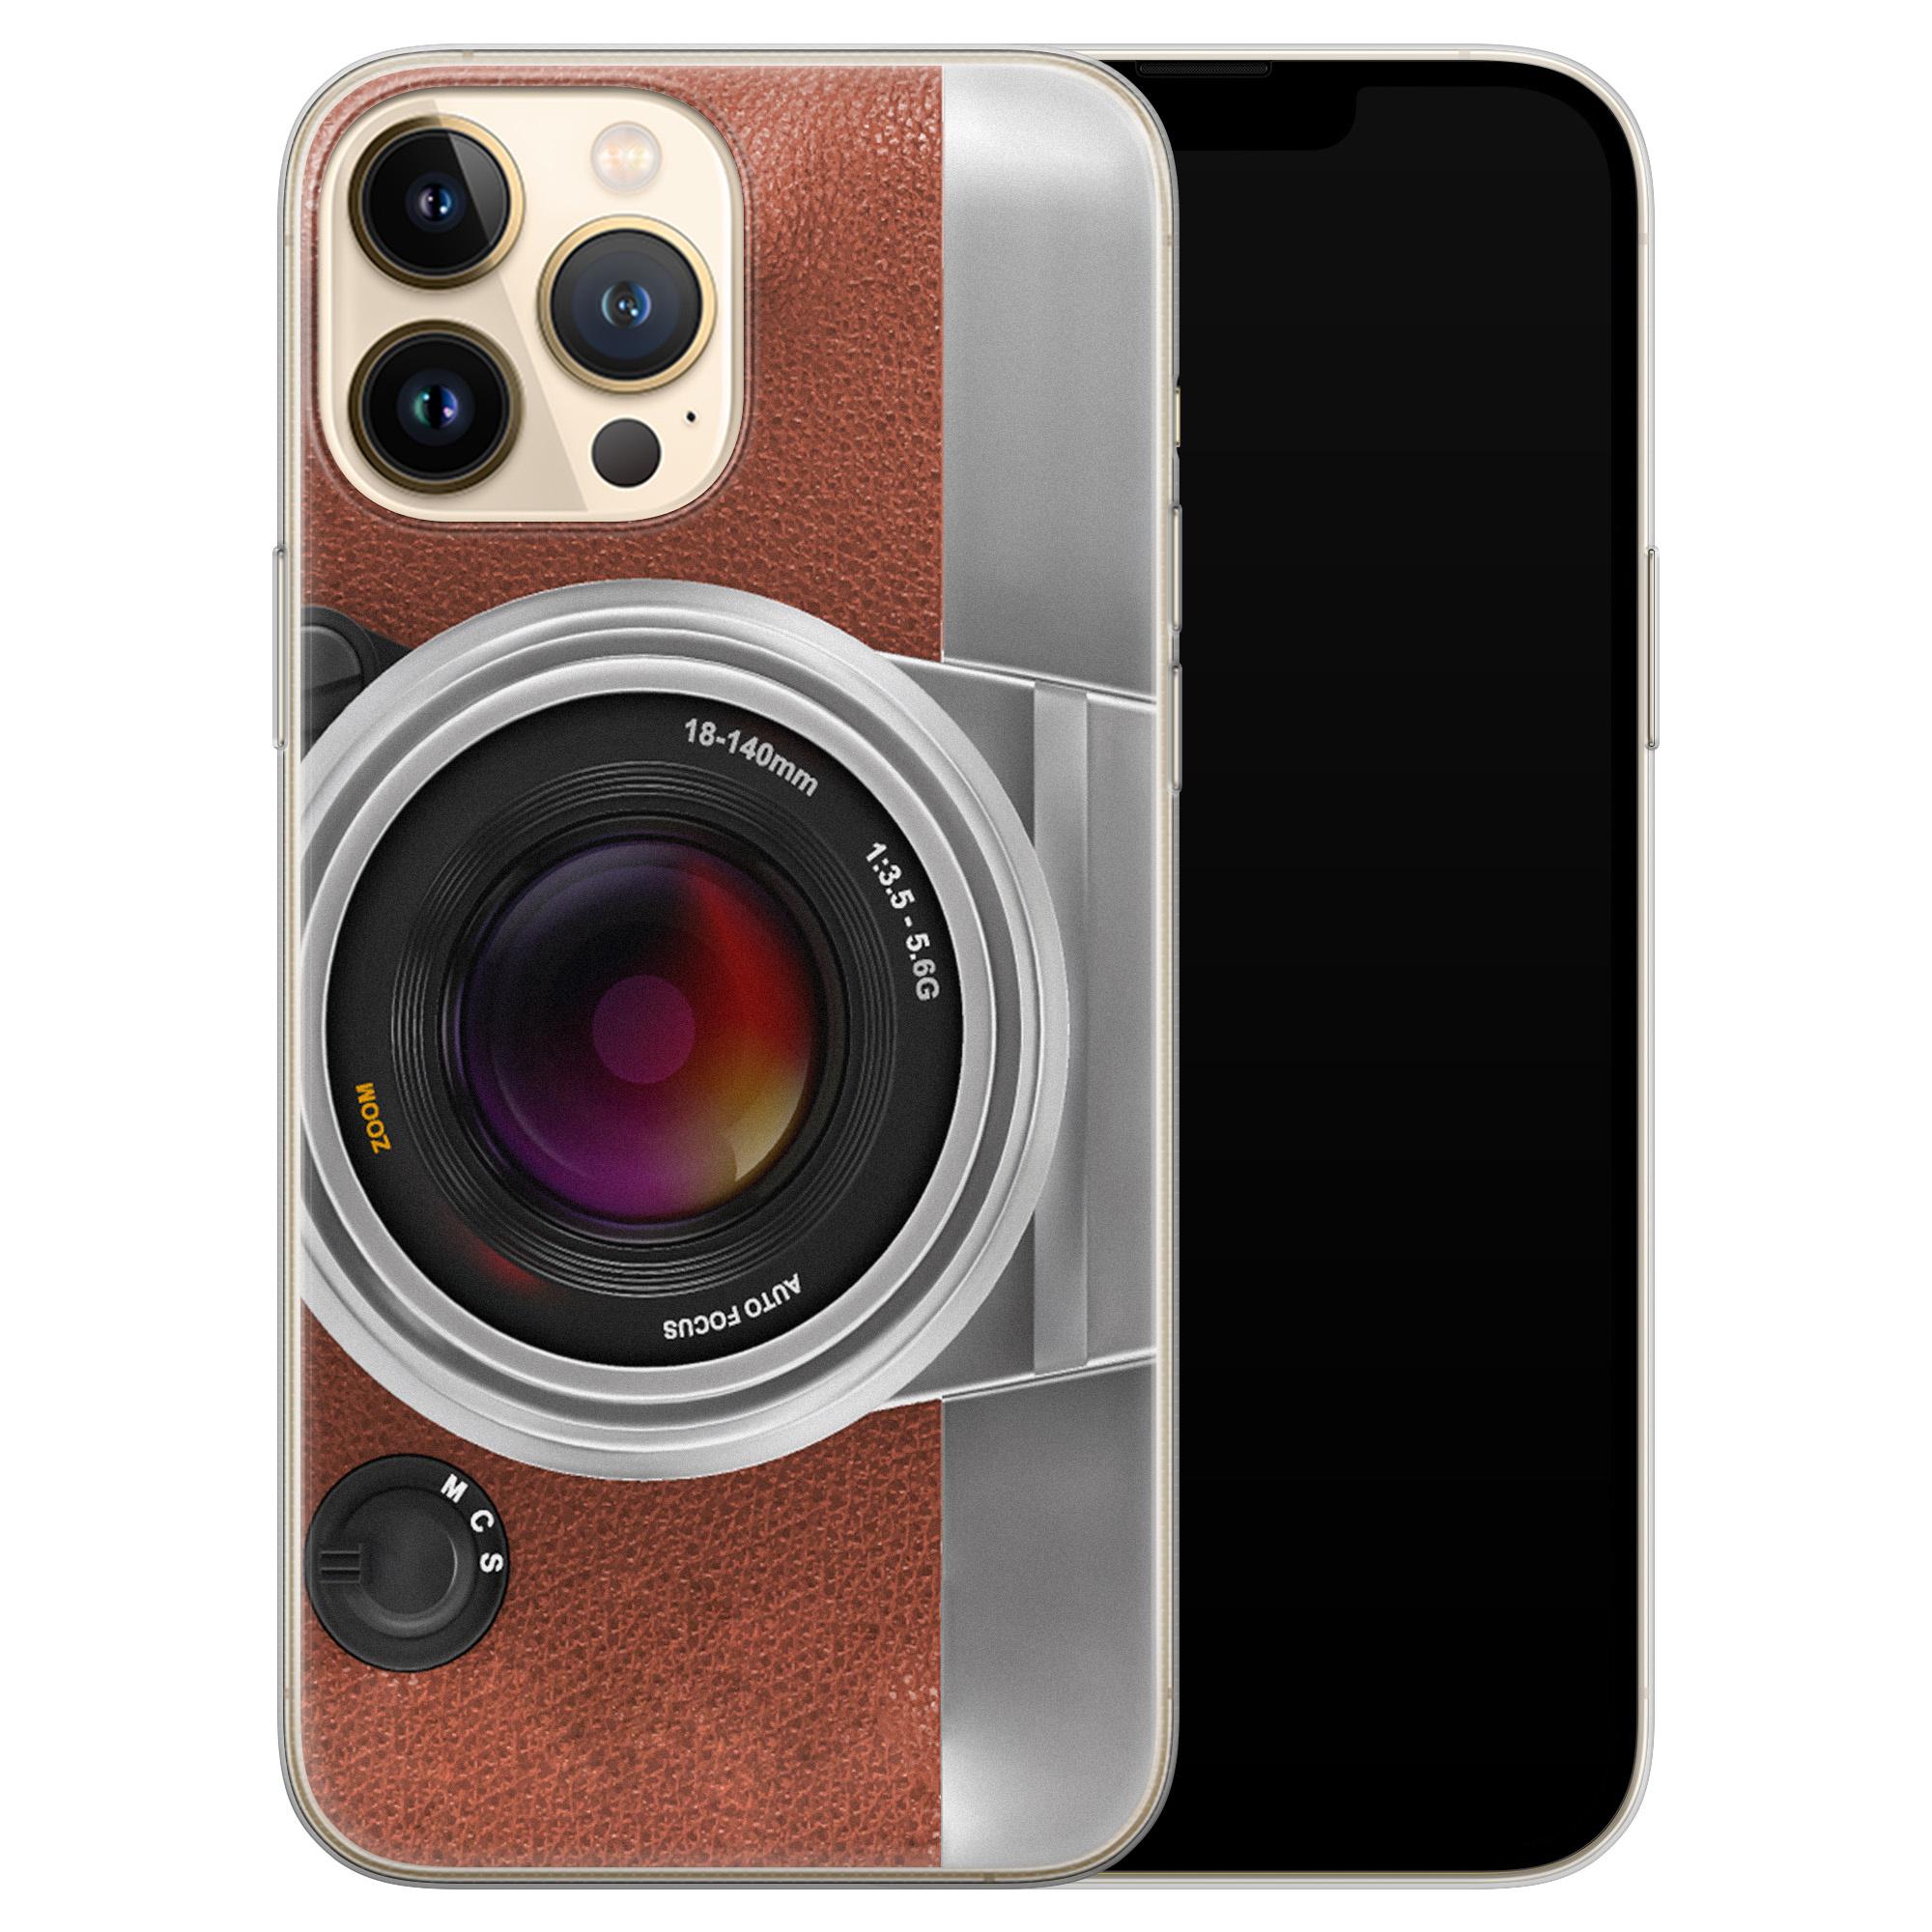 Leuke Telefoonhoesjes iPhone 13 Pro Max siliconen hoesje - Vintage camera